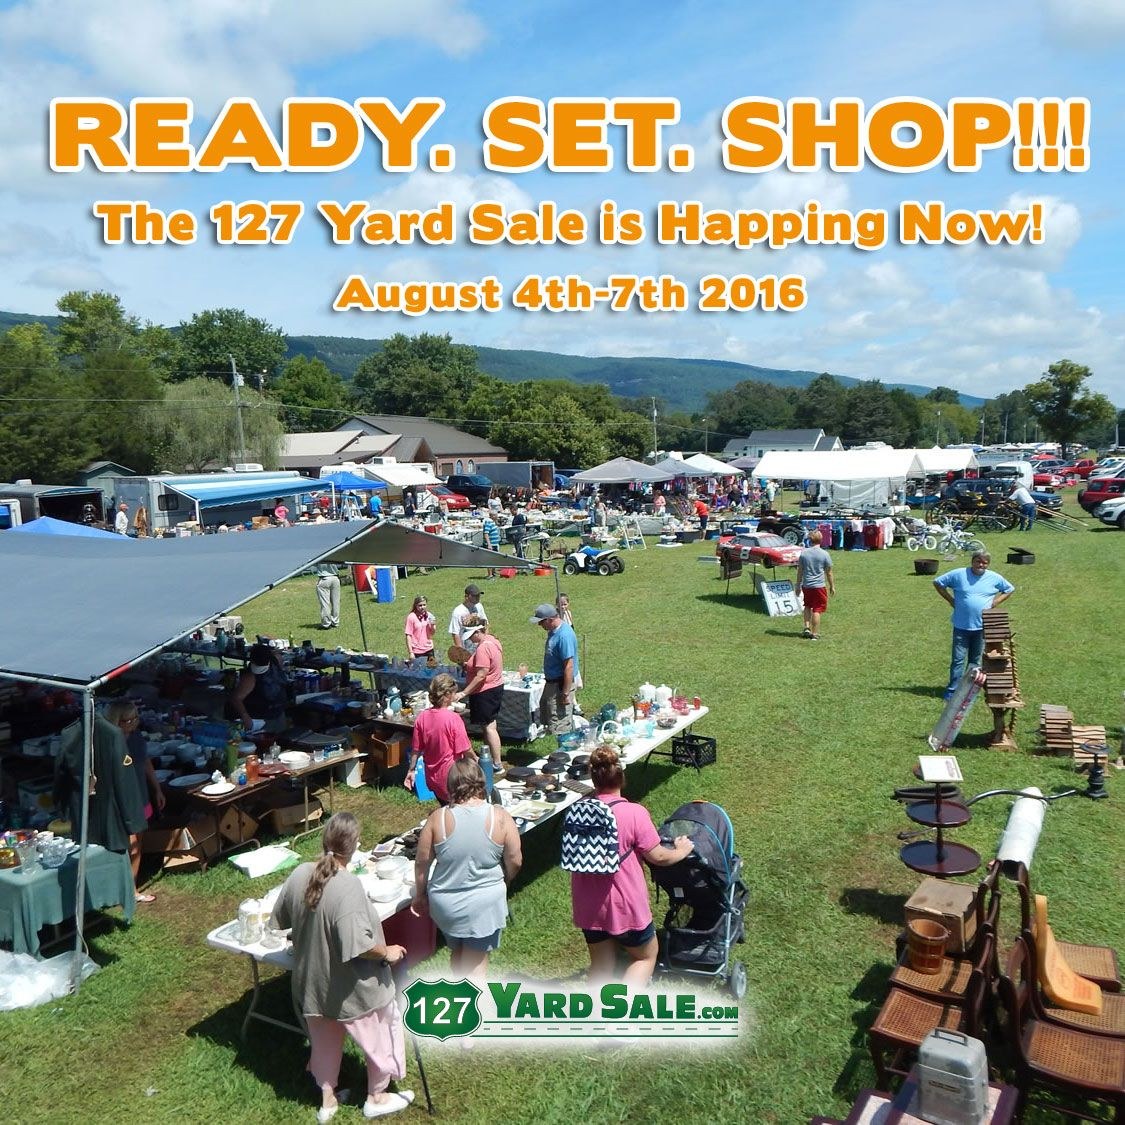 127 Yard Sale The World S Longest Yard Sale August 4th 7th